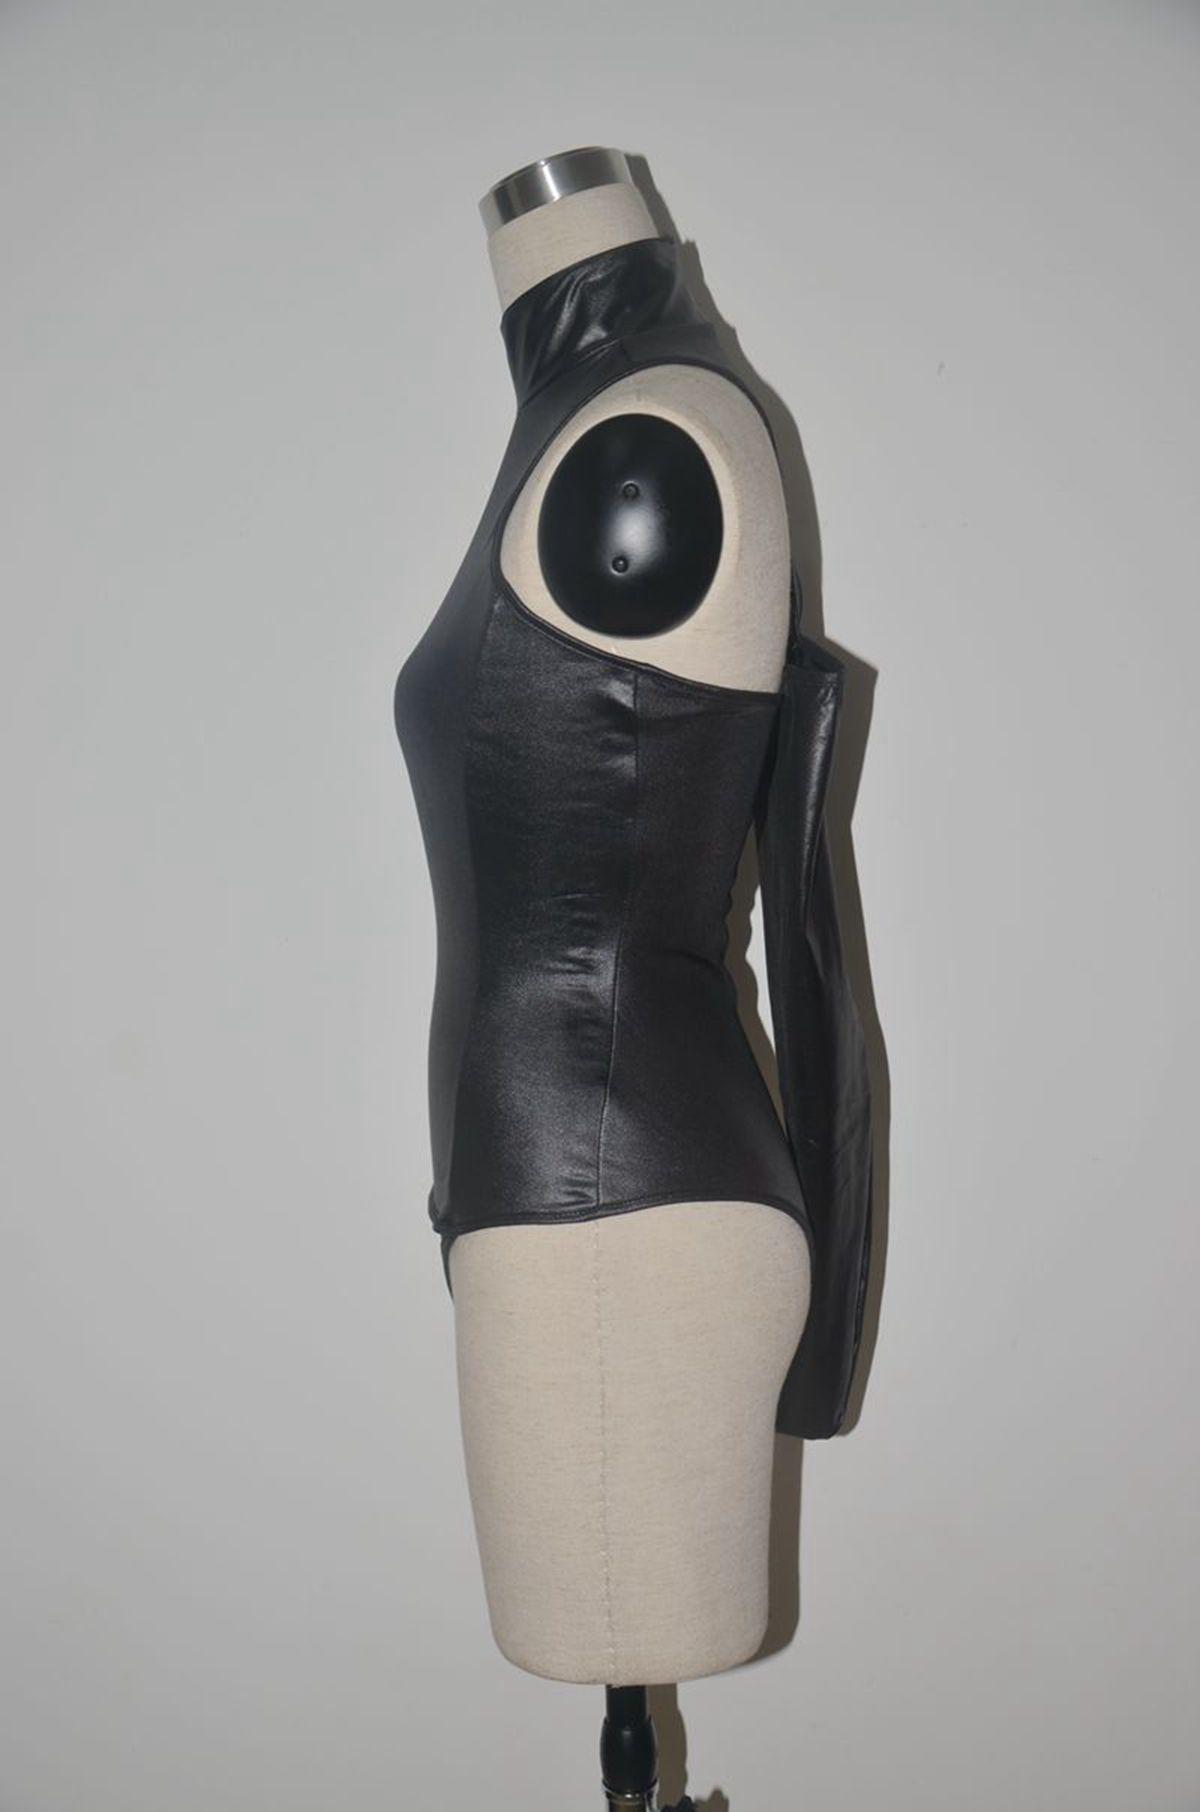 Sexy Skirts Women Leather Uniform Cosplay With Hat Sexy Underwear White Beauty Bundling Sexy Condole Belt Skirt